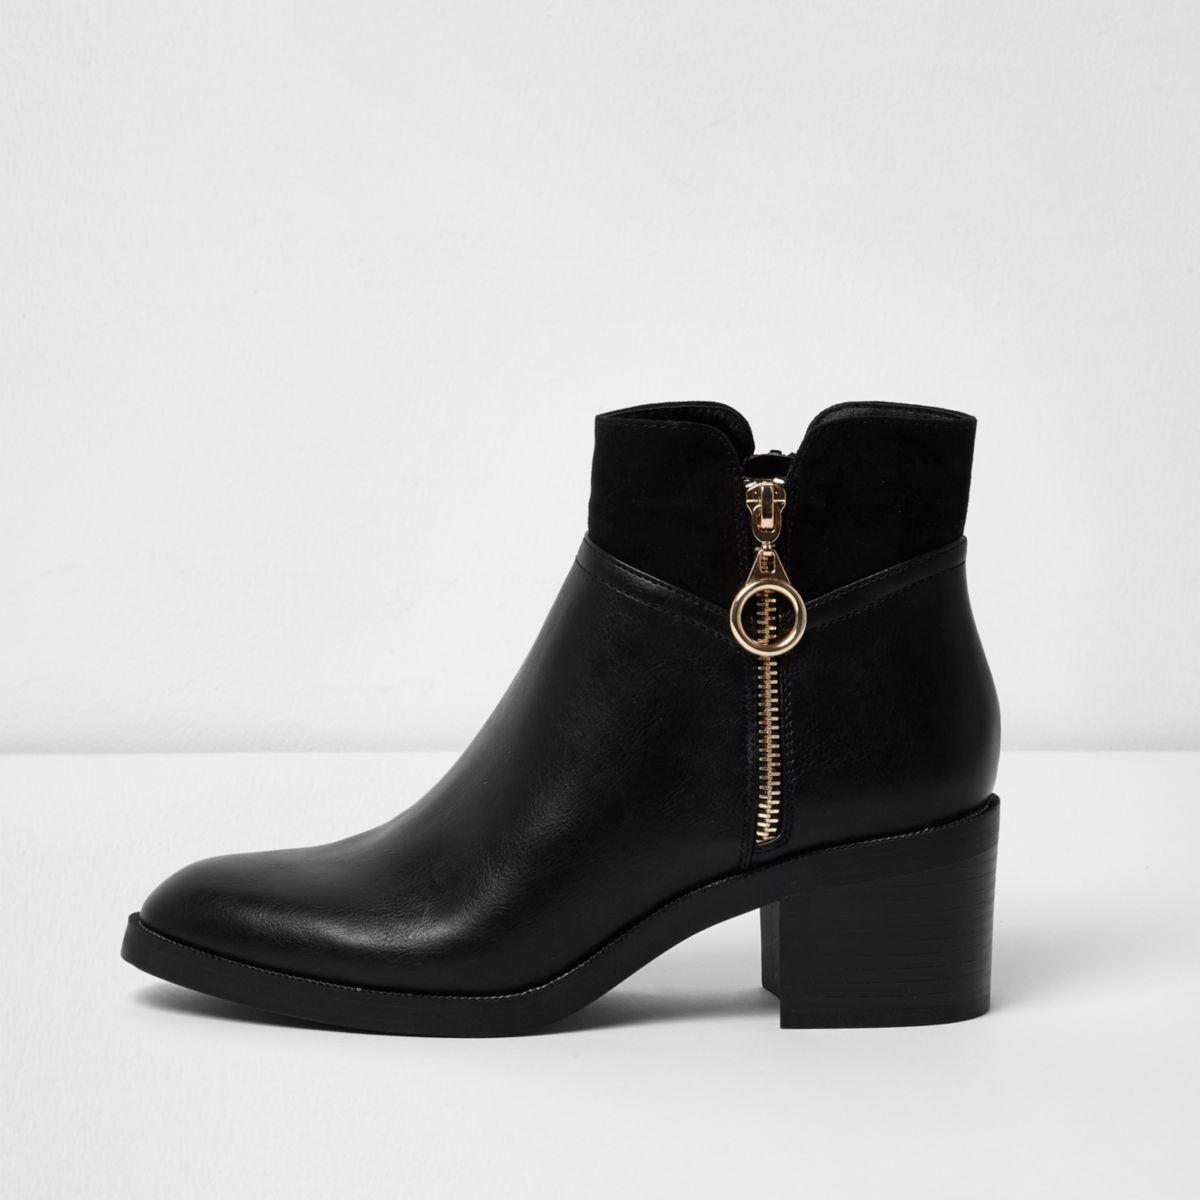 River Island Womens faux leather block heel shoe boots vK5FyX5